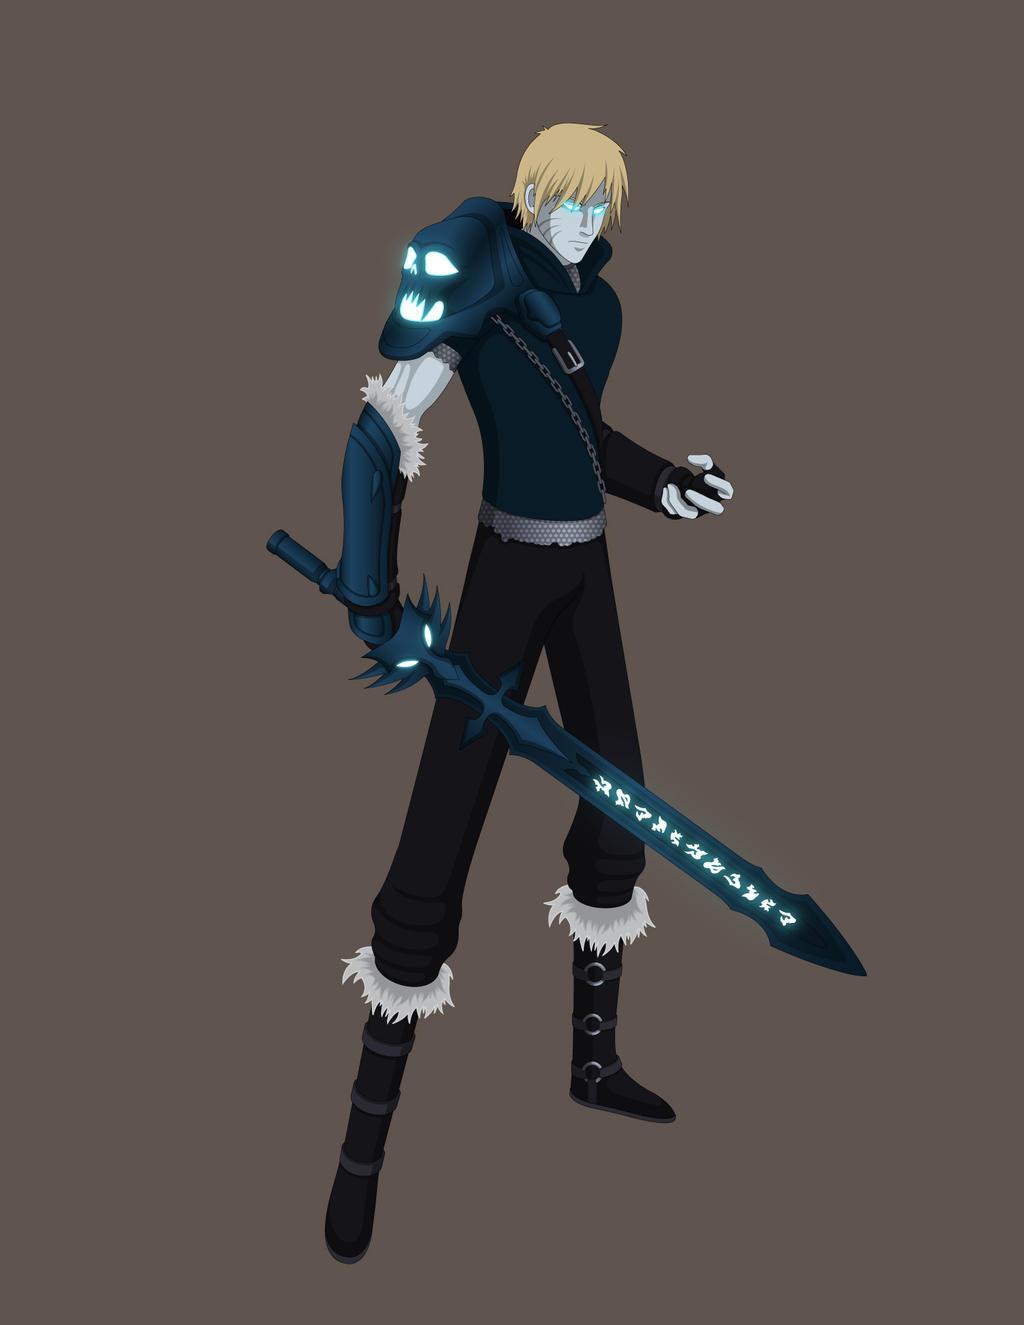 Naruto/WoWarcraft Crossover - Death Knight by Jarein